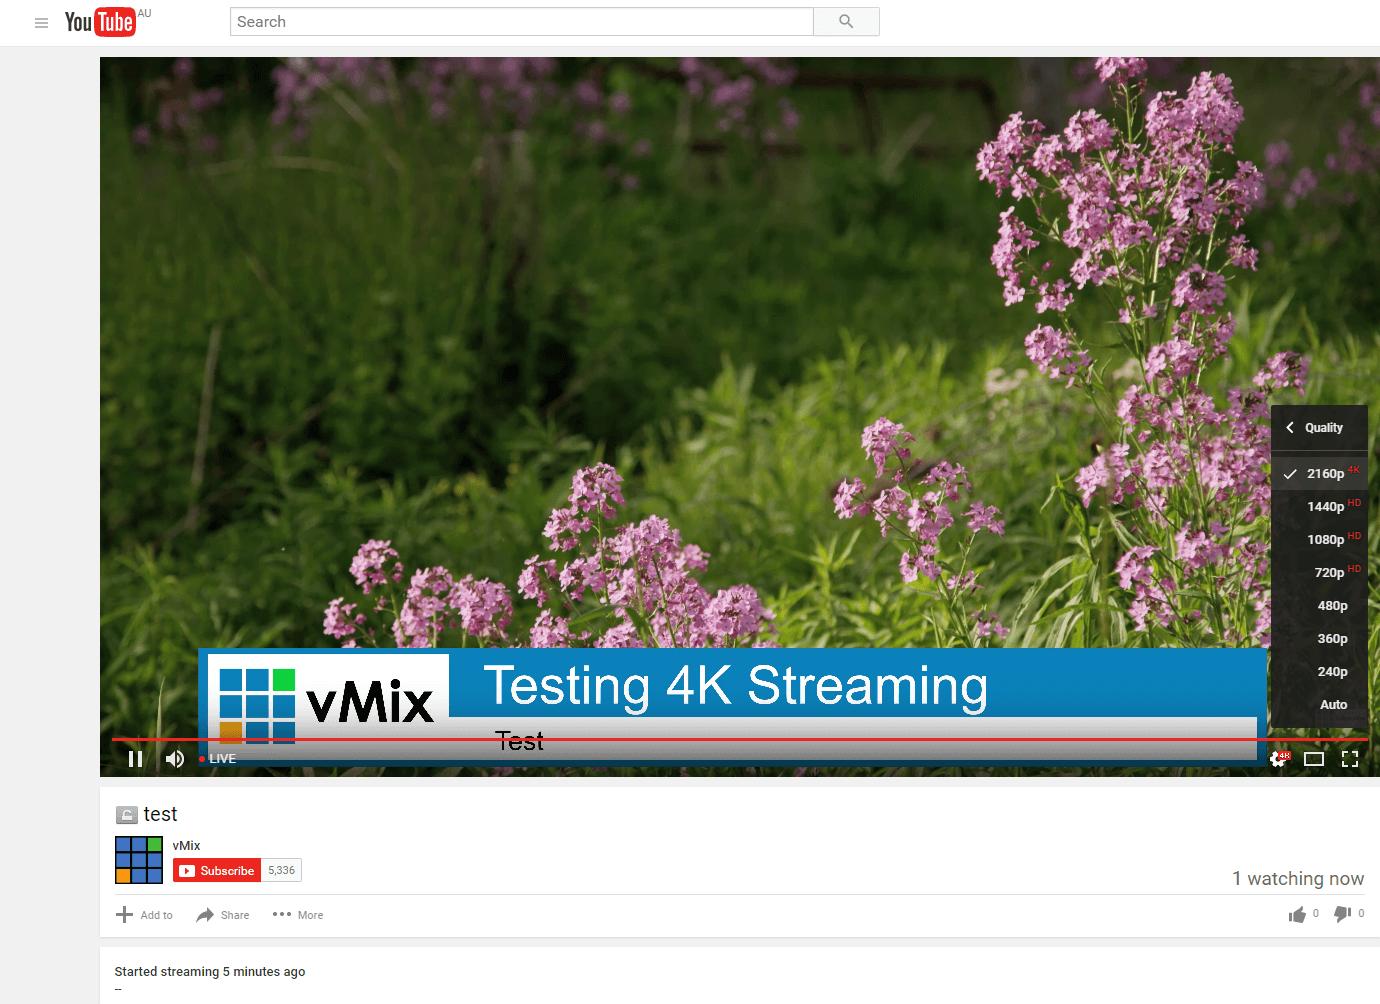 youtube-4k-live-stream-vMix